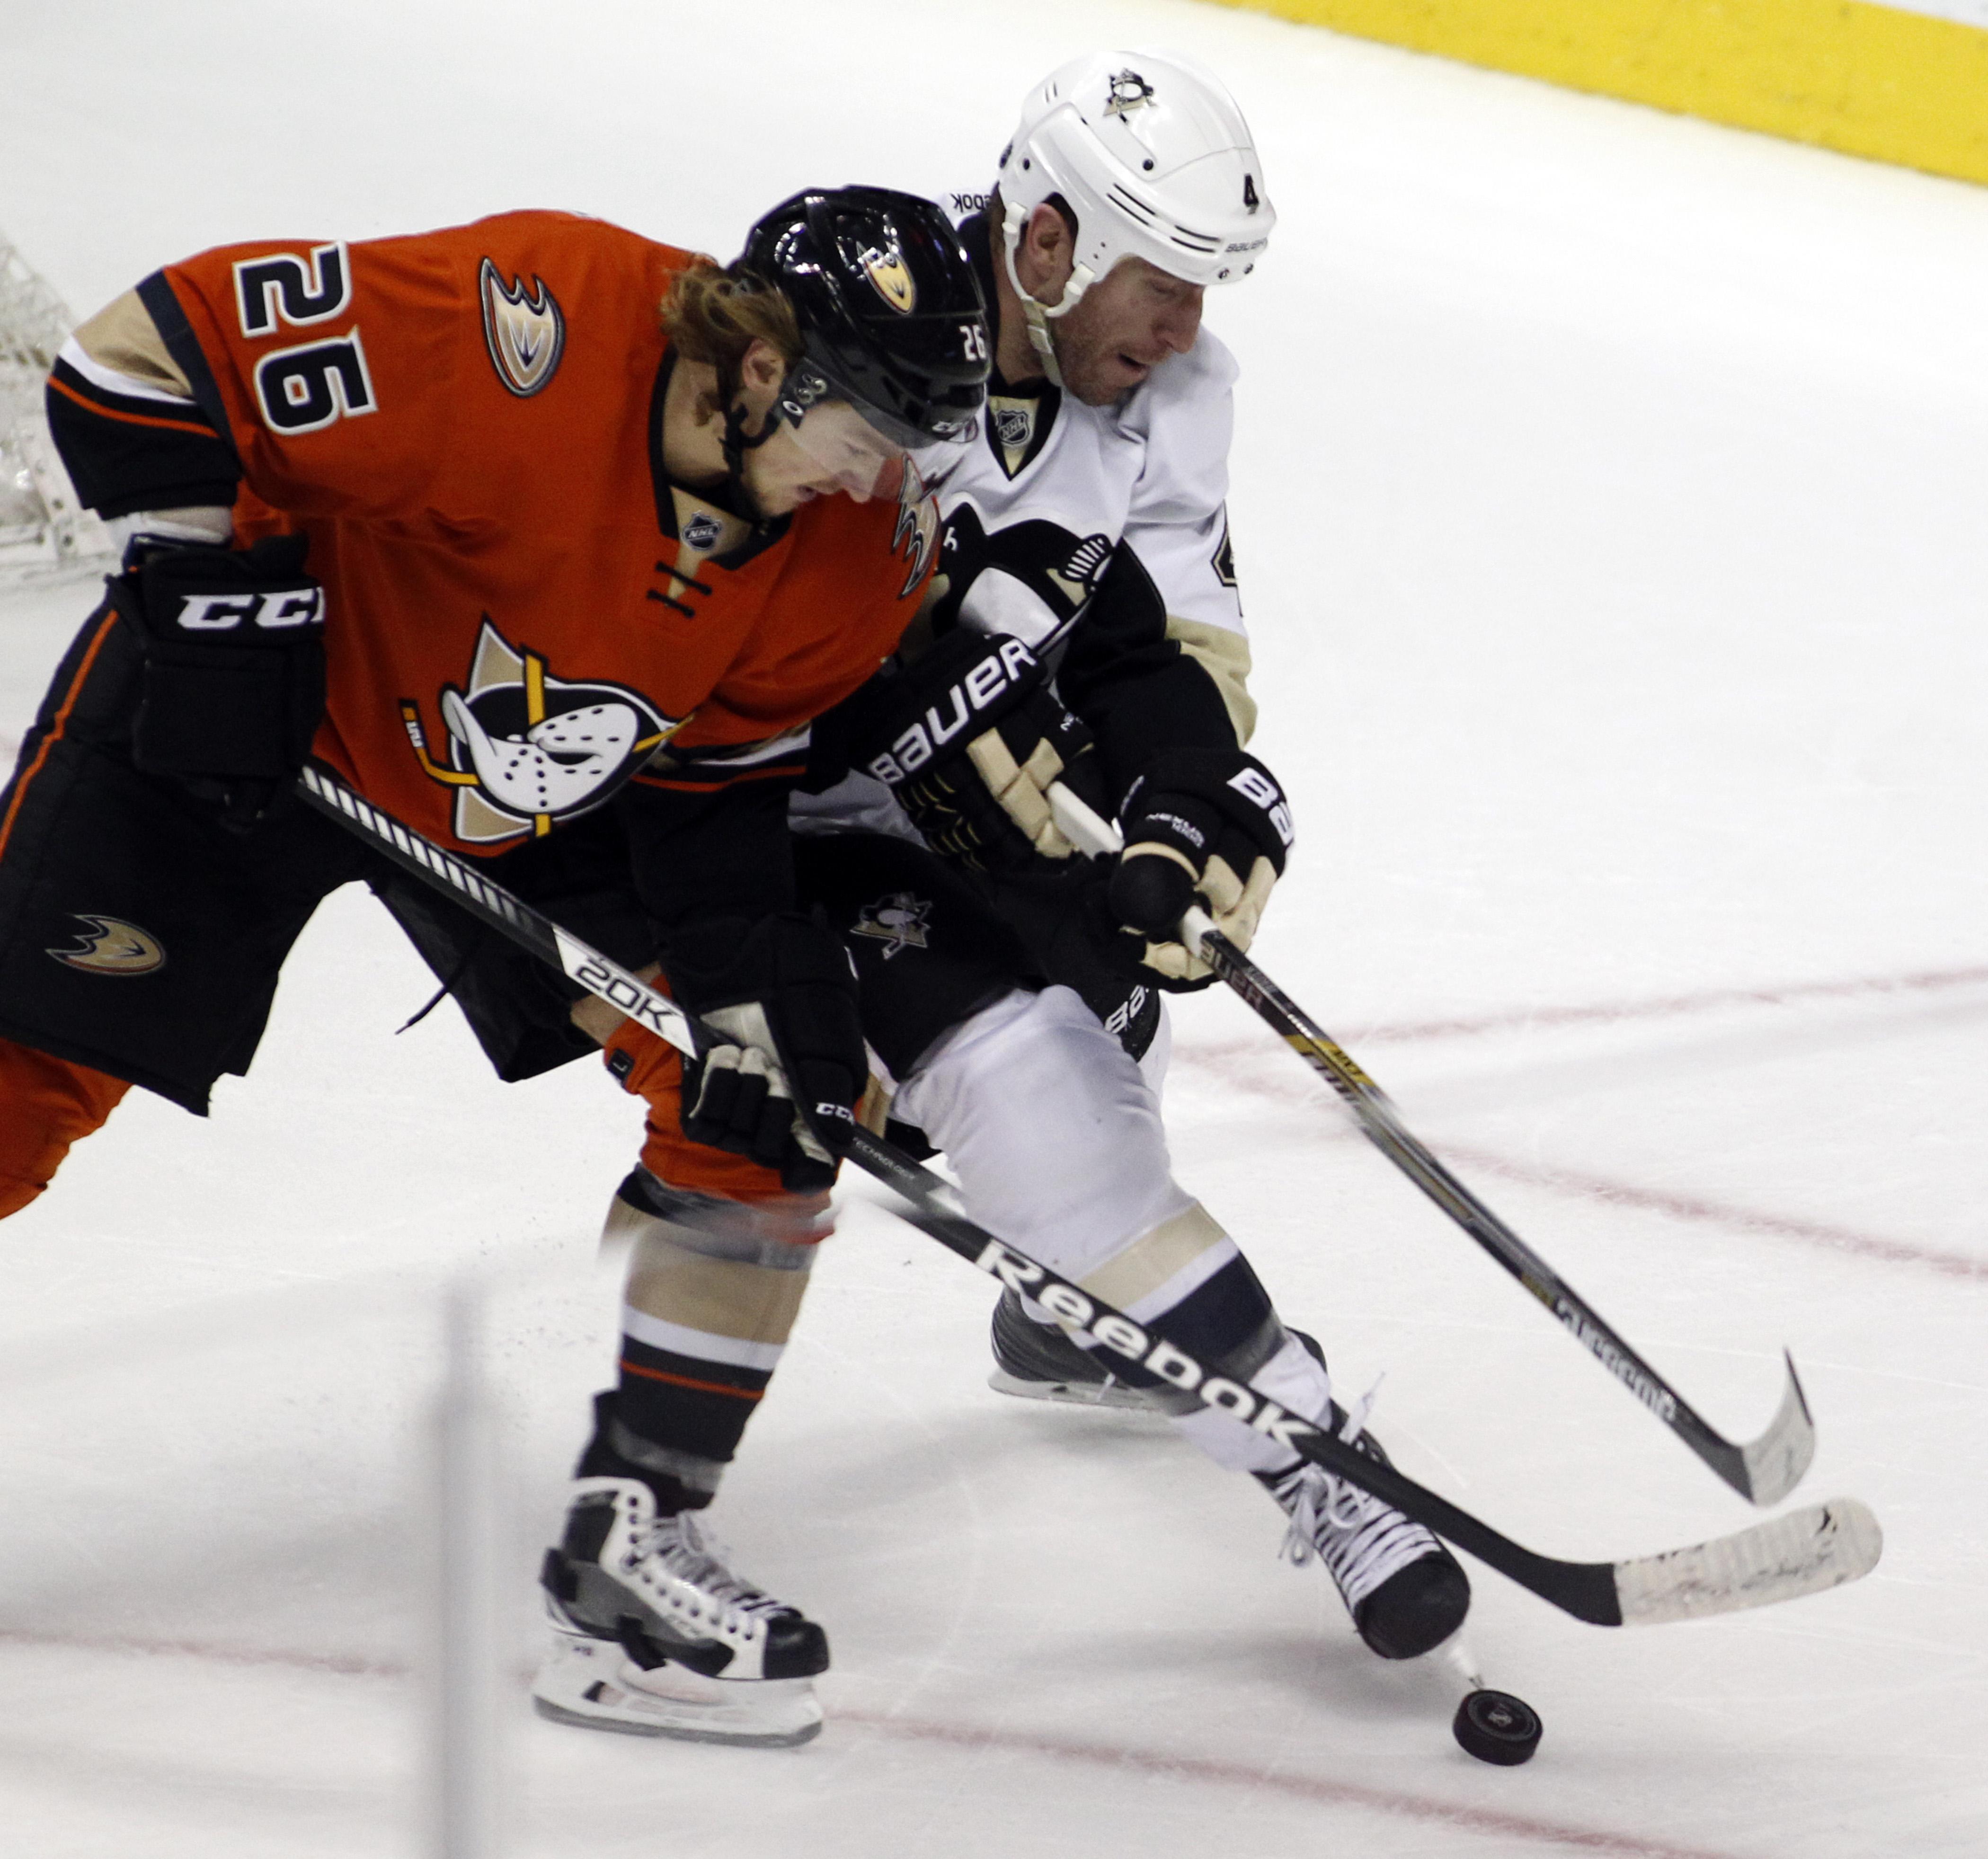 Anaheim Ducks left wing Carl Hagelin, left, battles Pittsburgh Penguins defenseman Rob Scuderi, right, for the puck during the third period of an NHL hockey game in Anaheim, Calif., Sunday, Dec. 6, 2015.  The Ducks won 2-1. (AP Photo/Alex Gallardo)